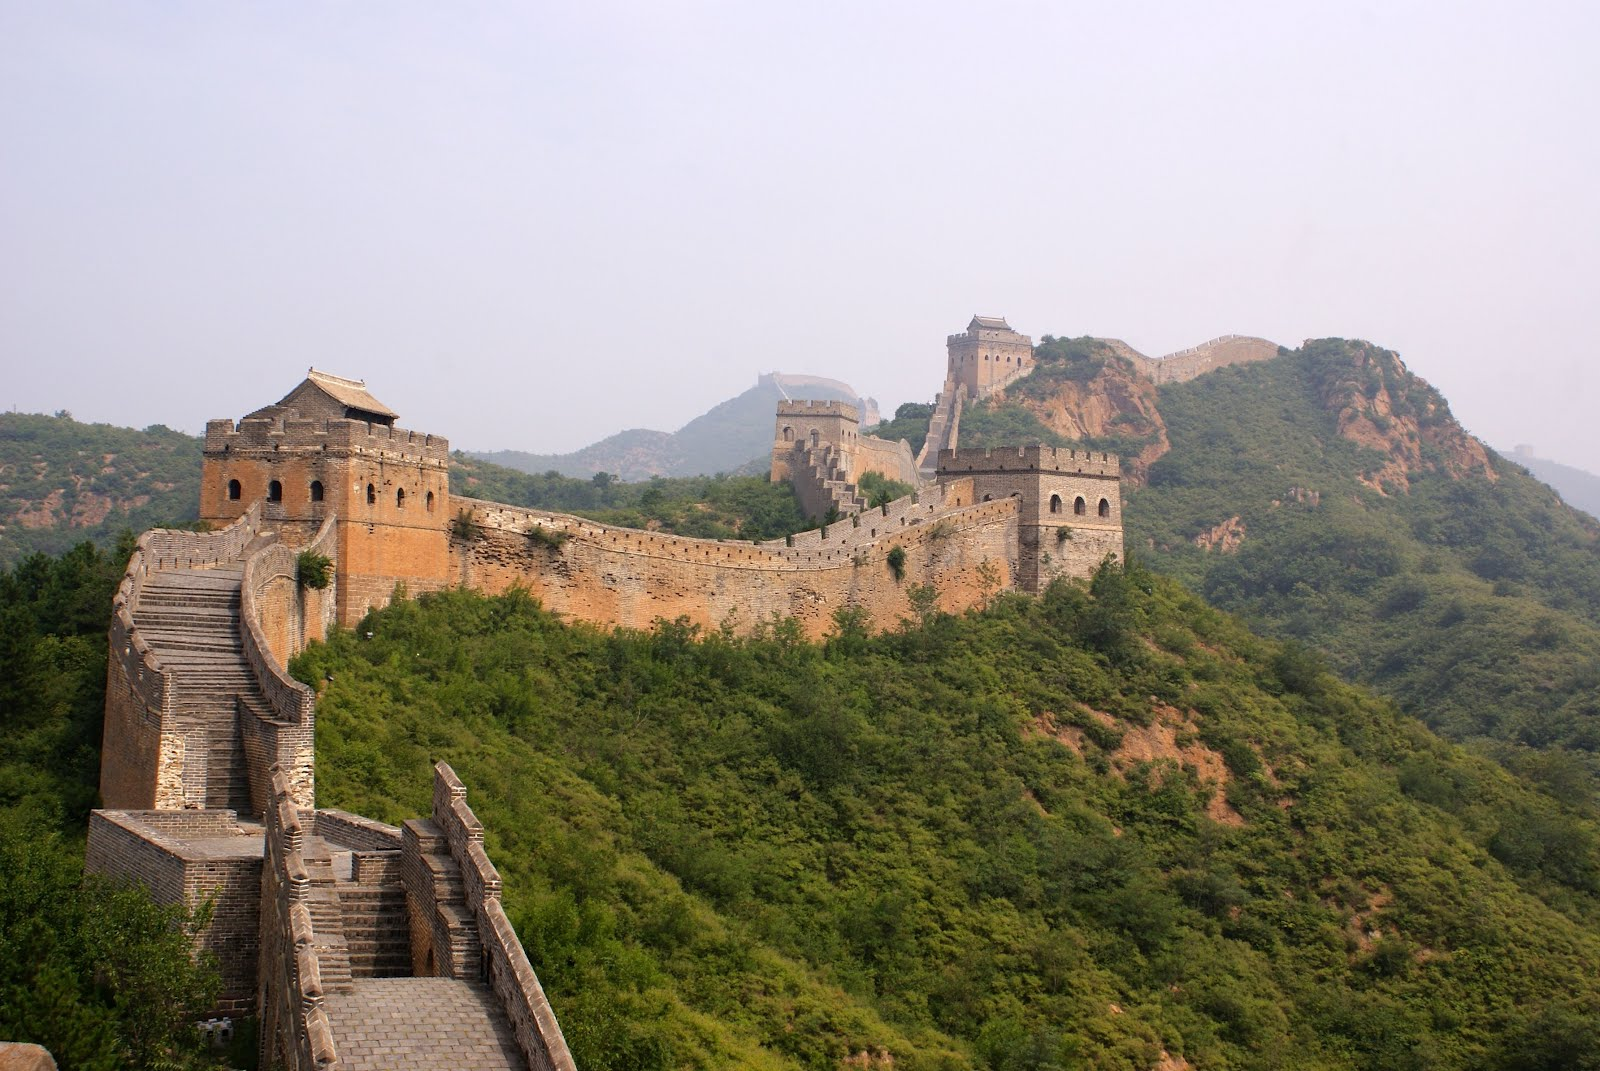 http://1.bp.blogspot.com/-47NV1lheegw/UGMM_Nnr7tI/AAAAAAABJyc/fmMgnFYODFU/s1600/vista-espectacular-de-la-muralla-china-grandes-maravillas-de-nuestro-planeta-.jpg